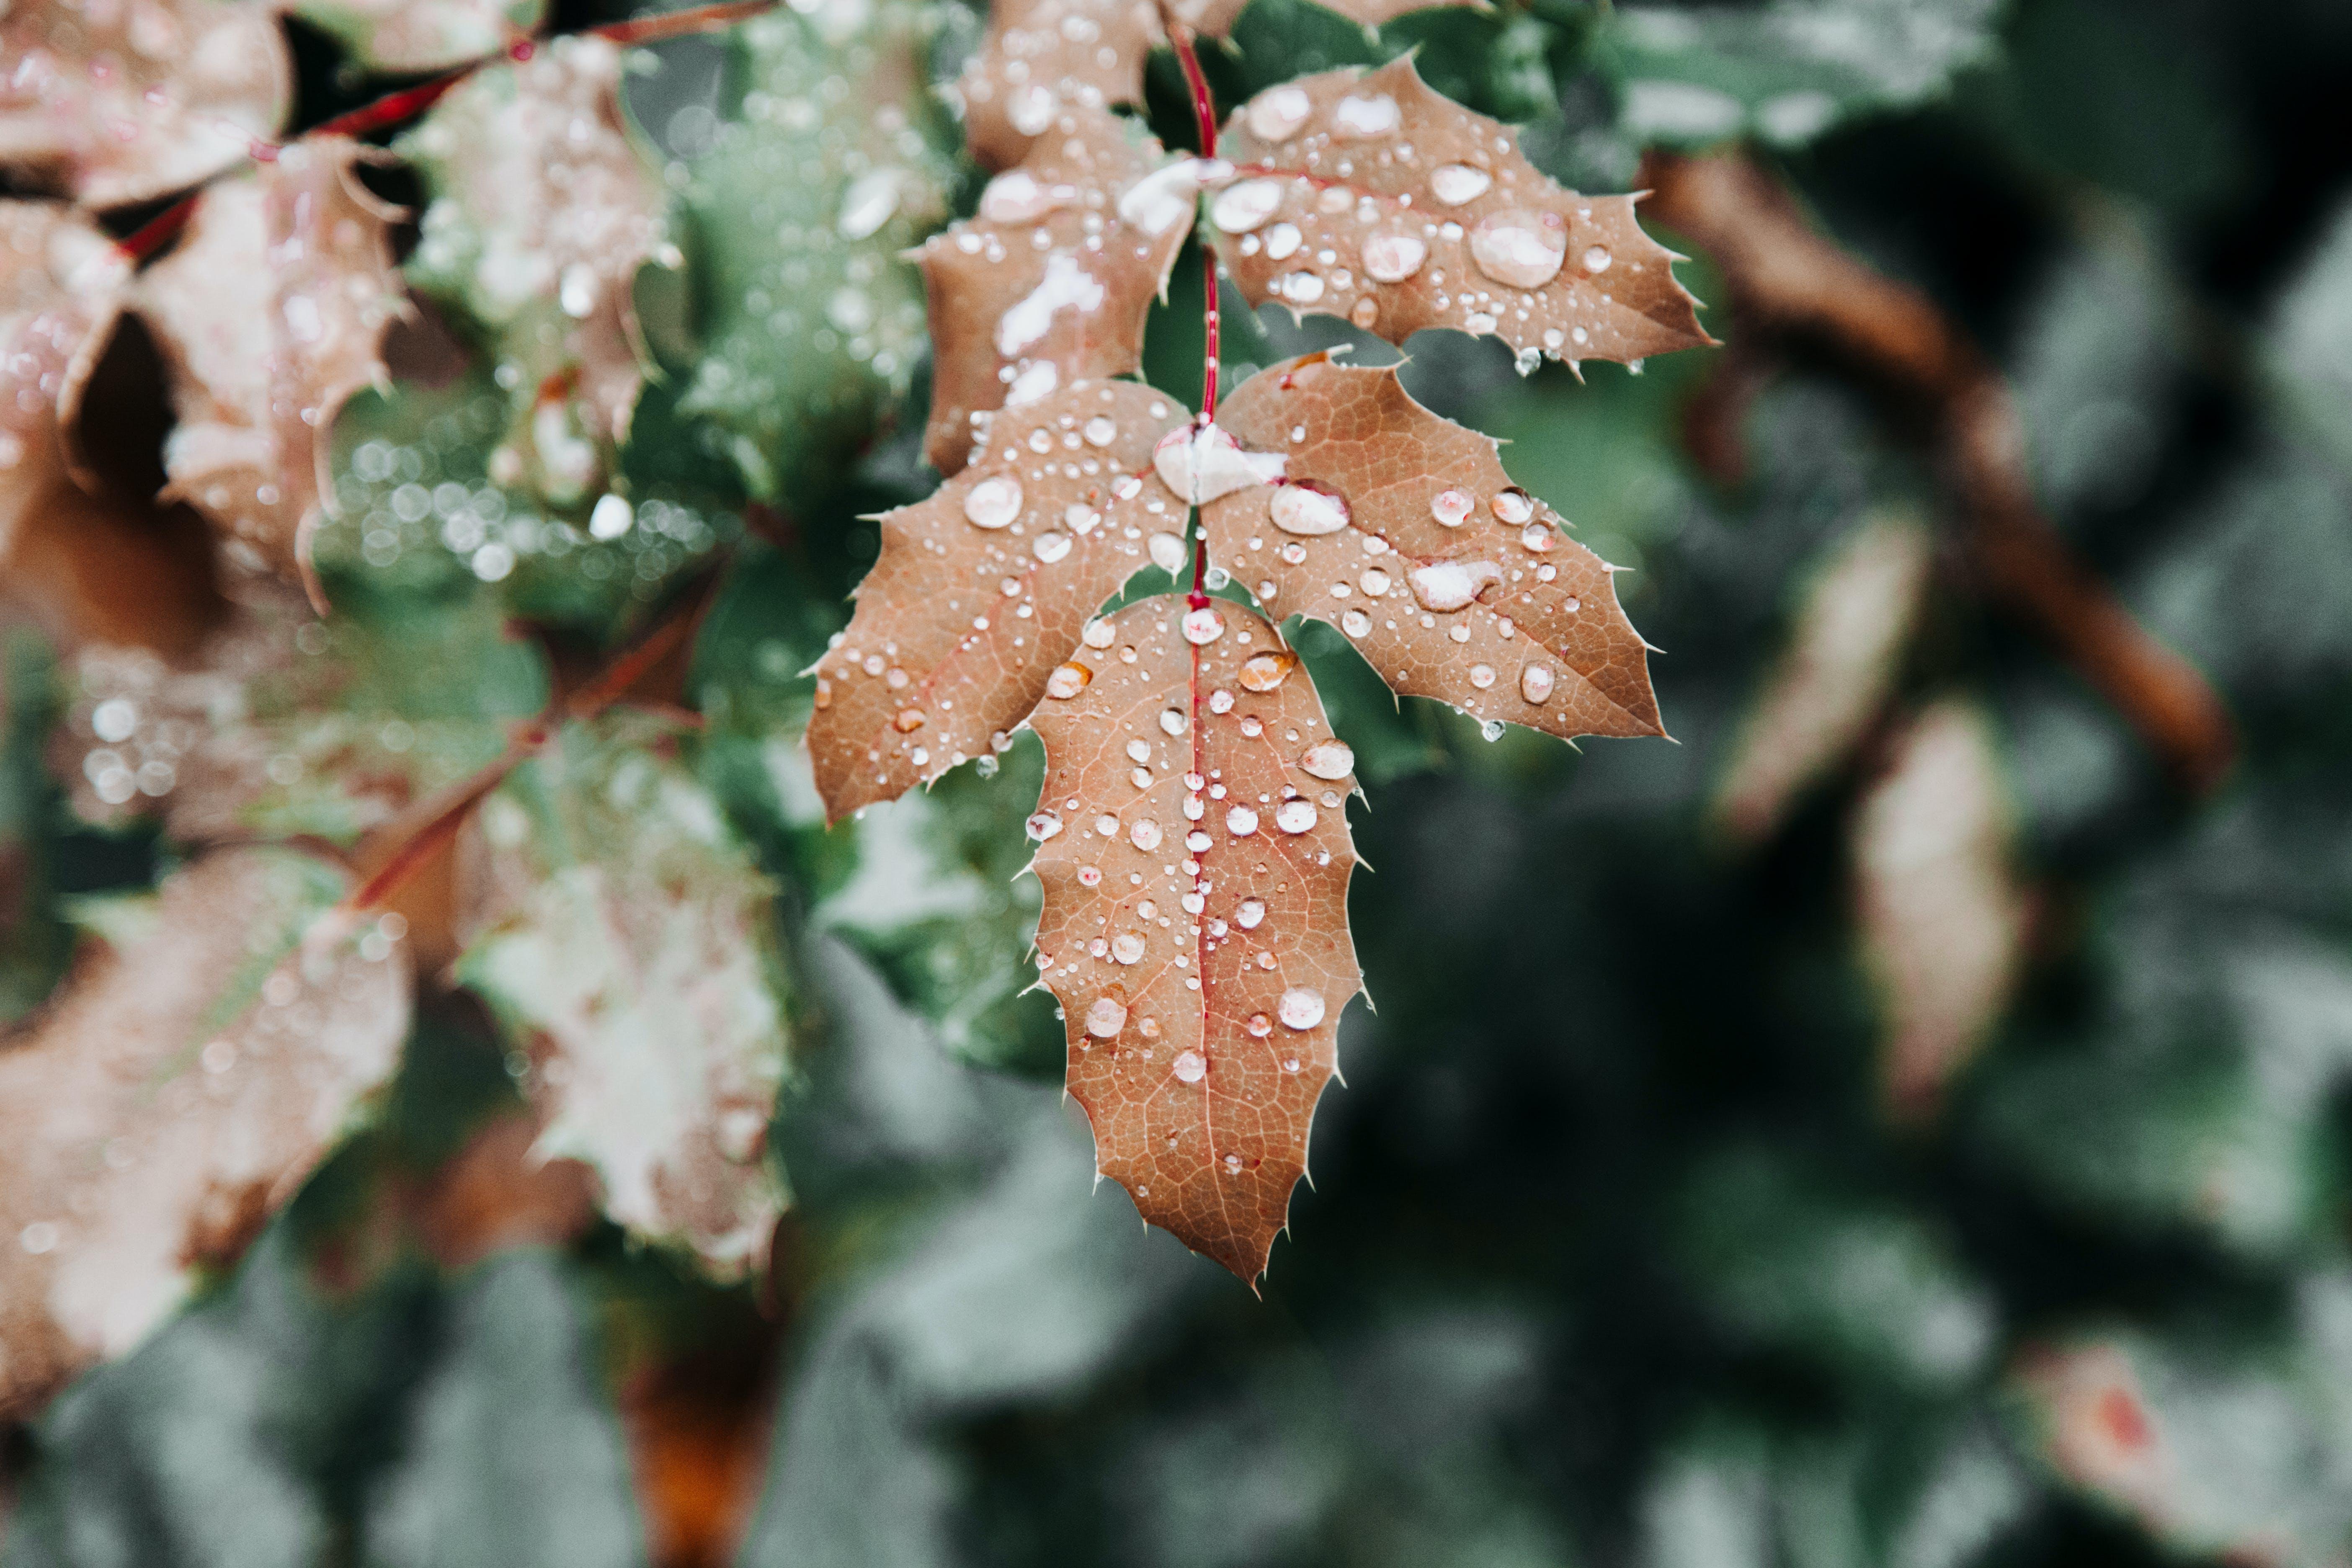 Brown Leafed Plant With Water Dews